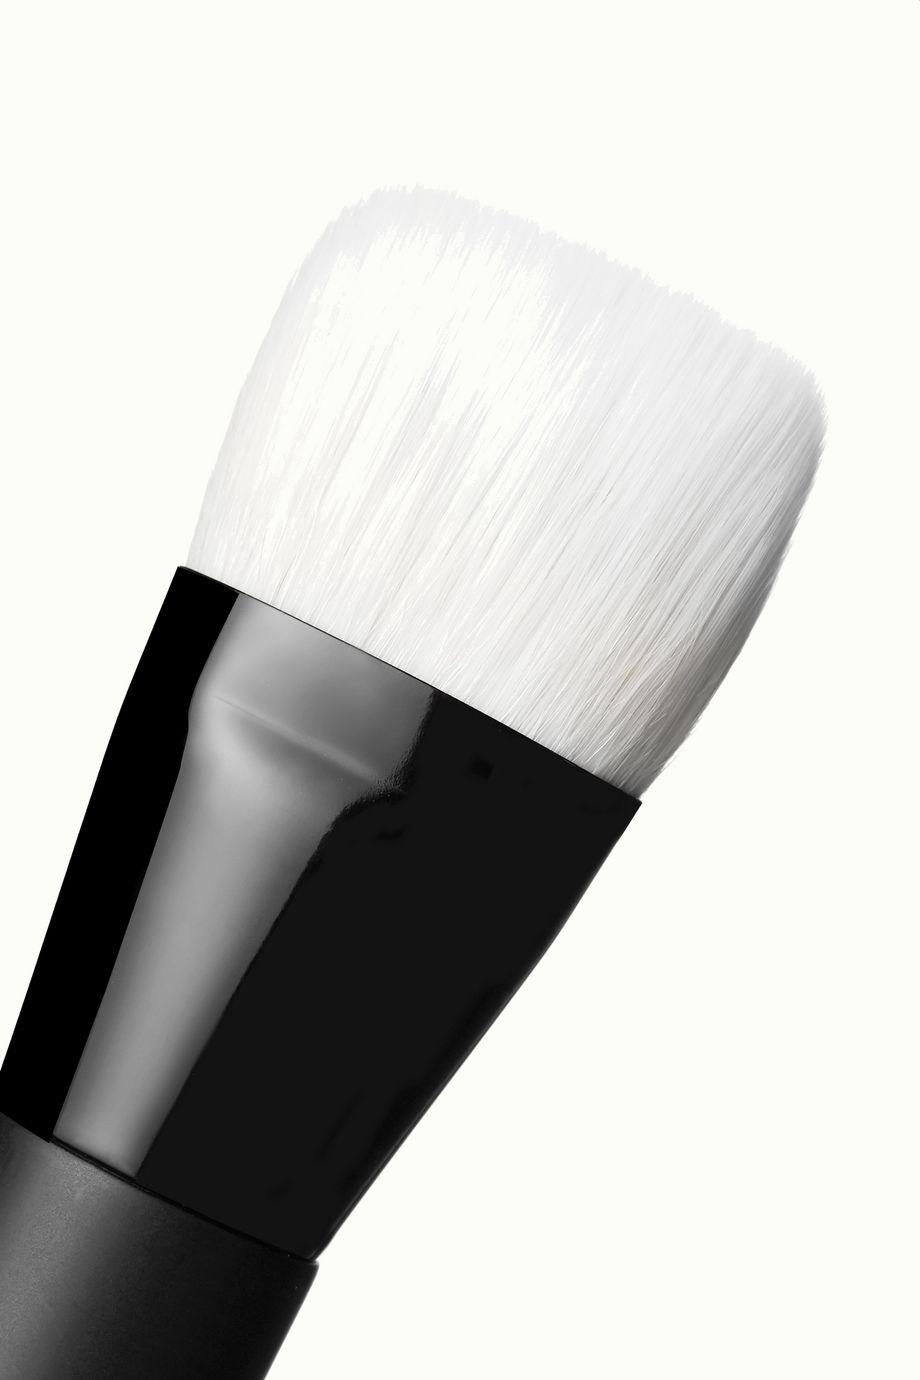 Rae Morris Jishaku 23.1 Mini Liquid Foundation Brush